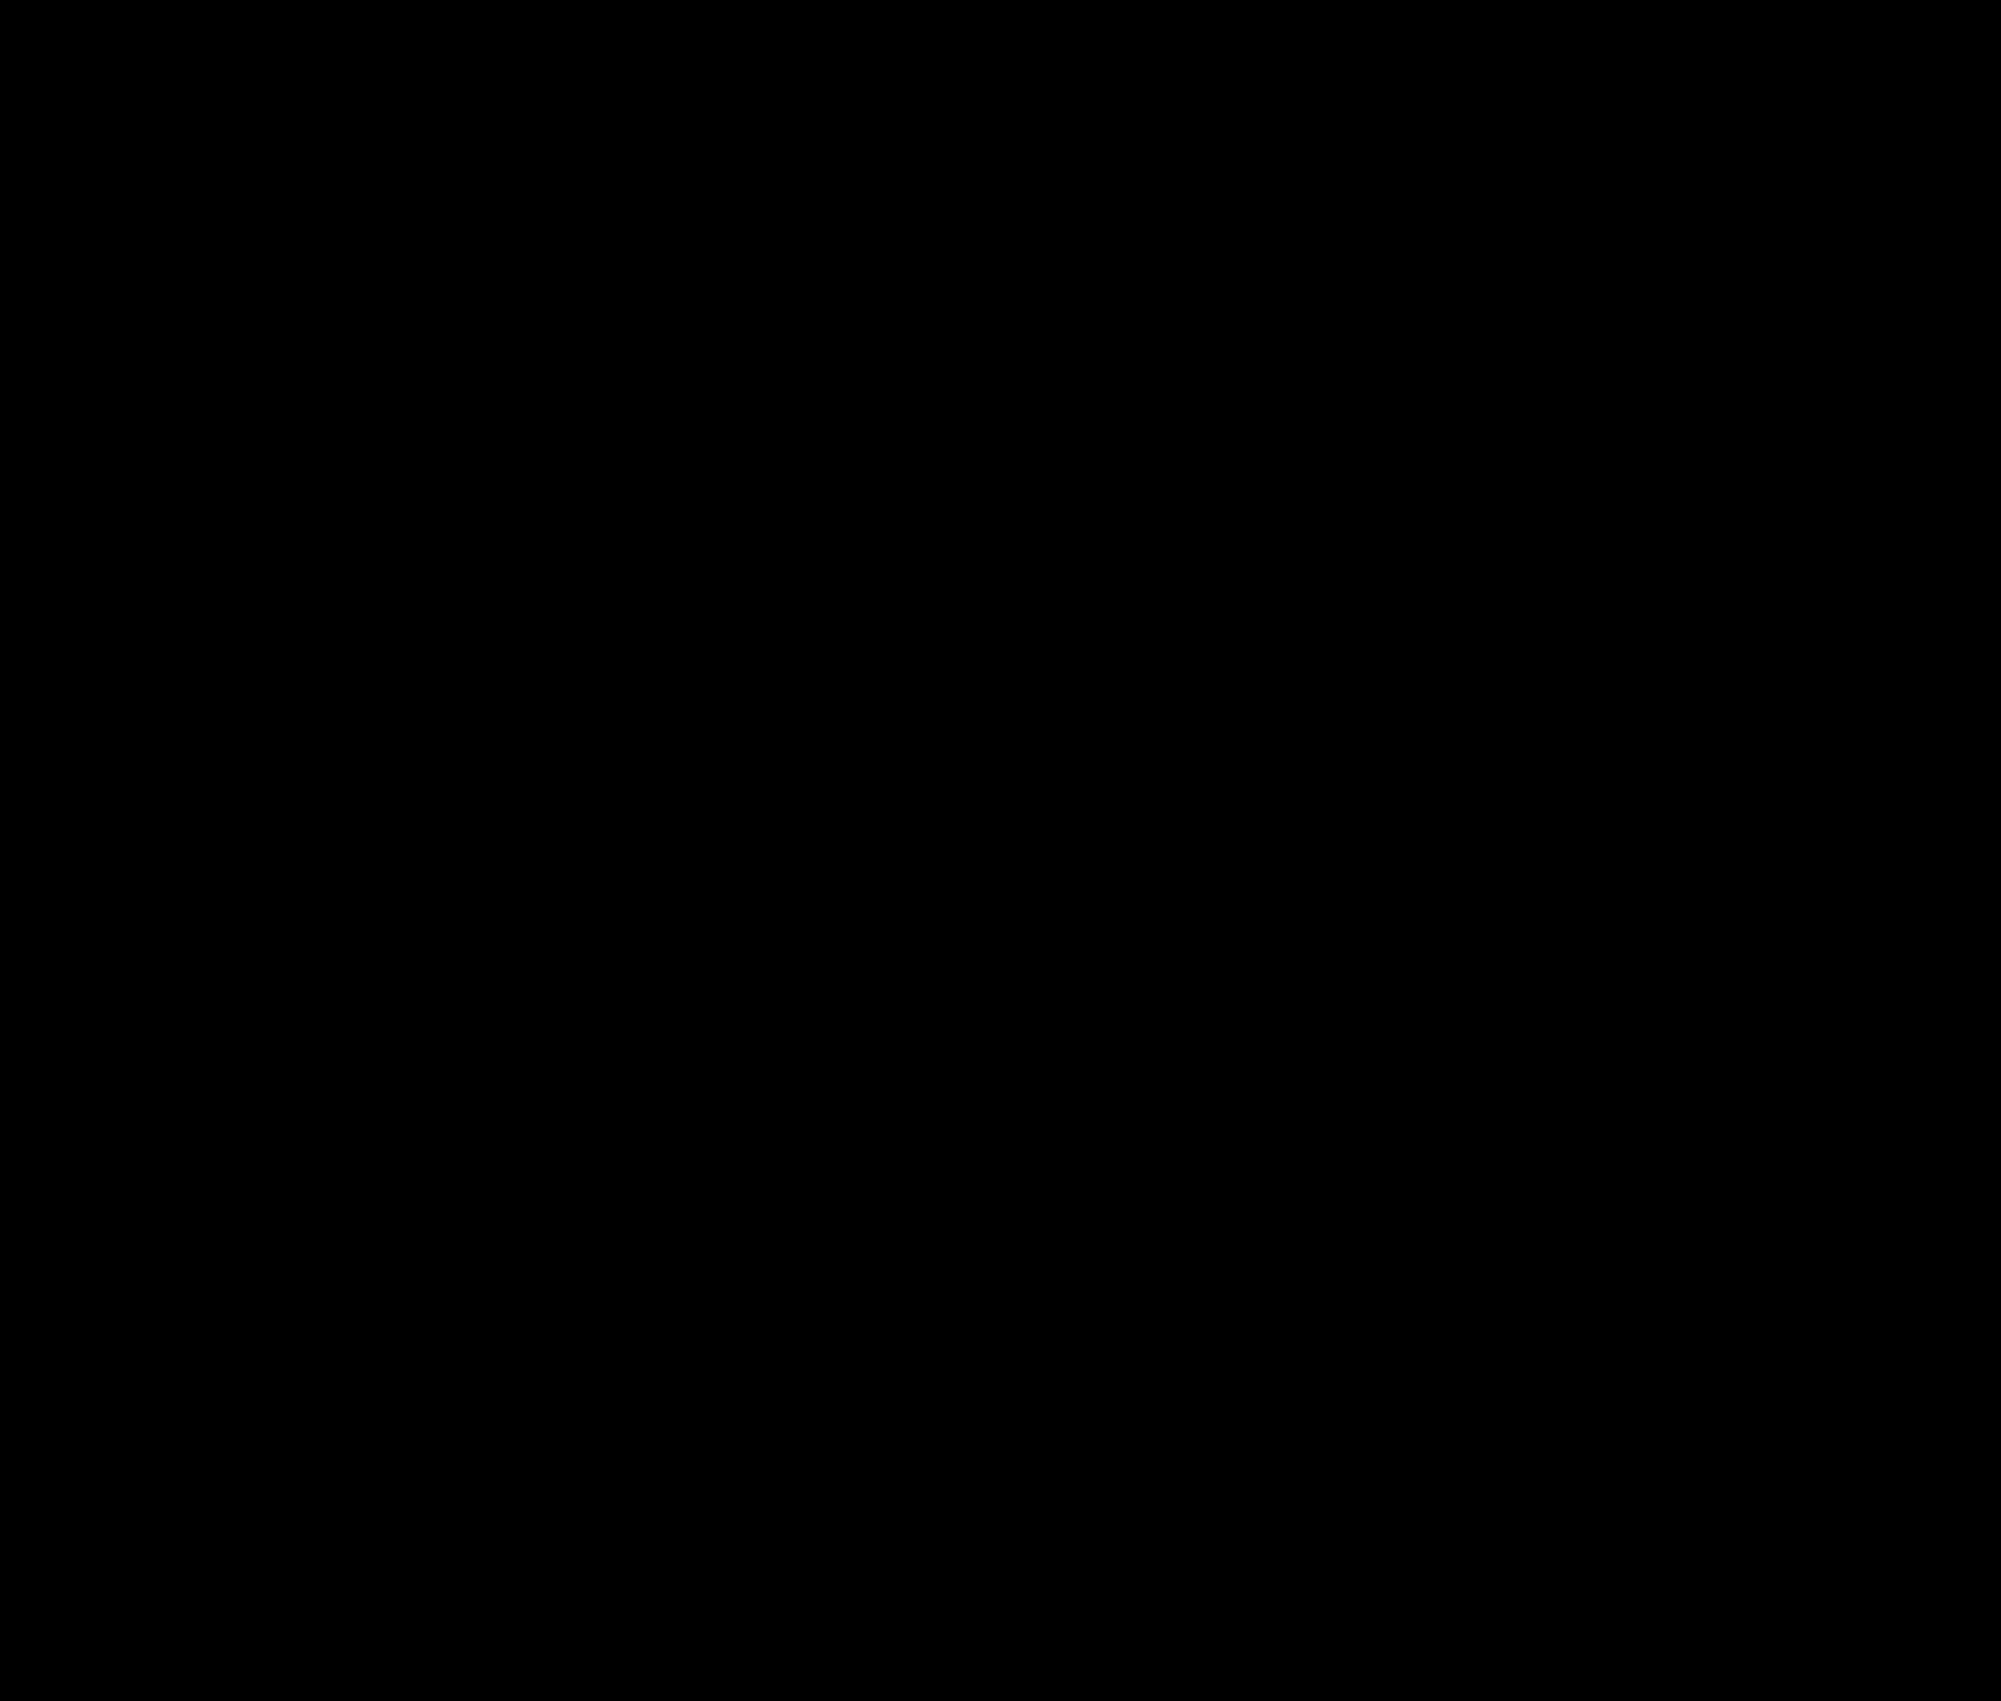 61 611687 naruto clipart logo hidden leaf village symbol